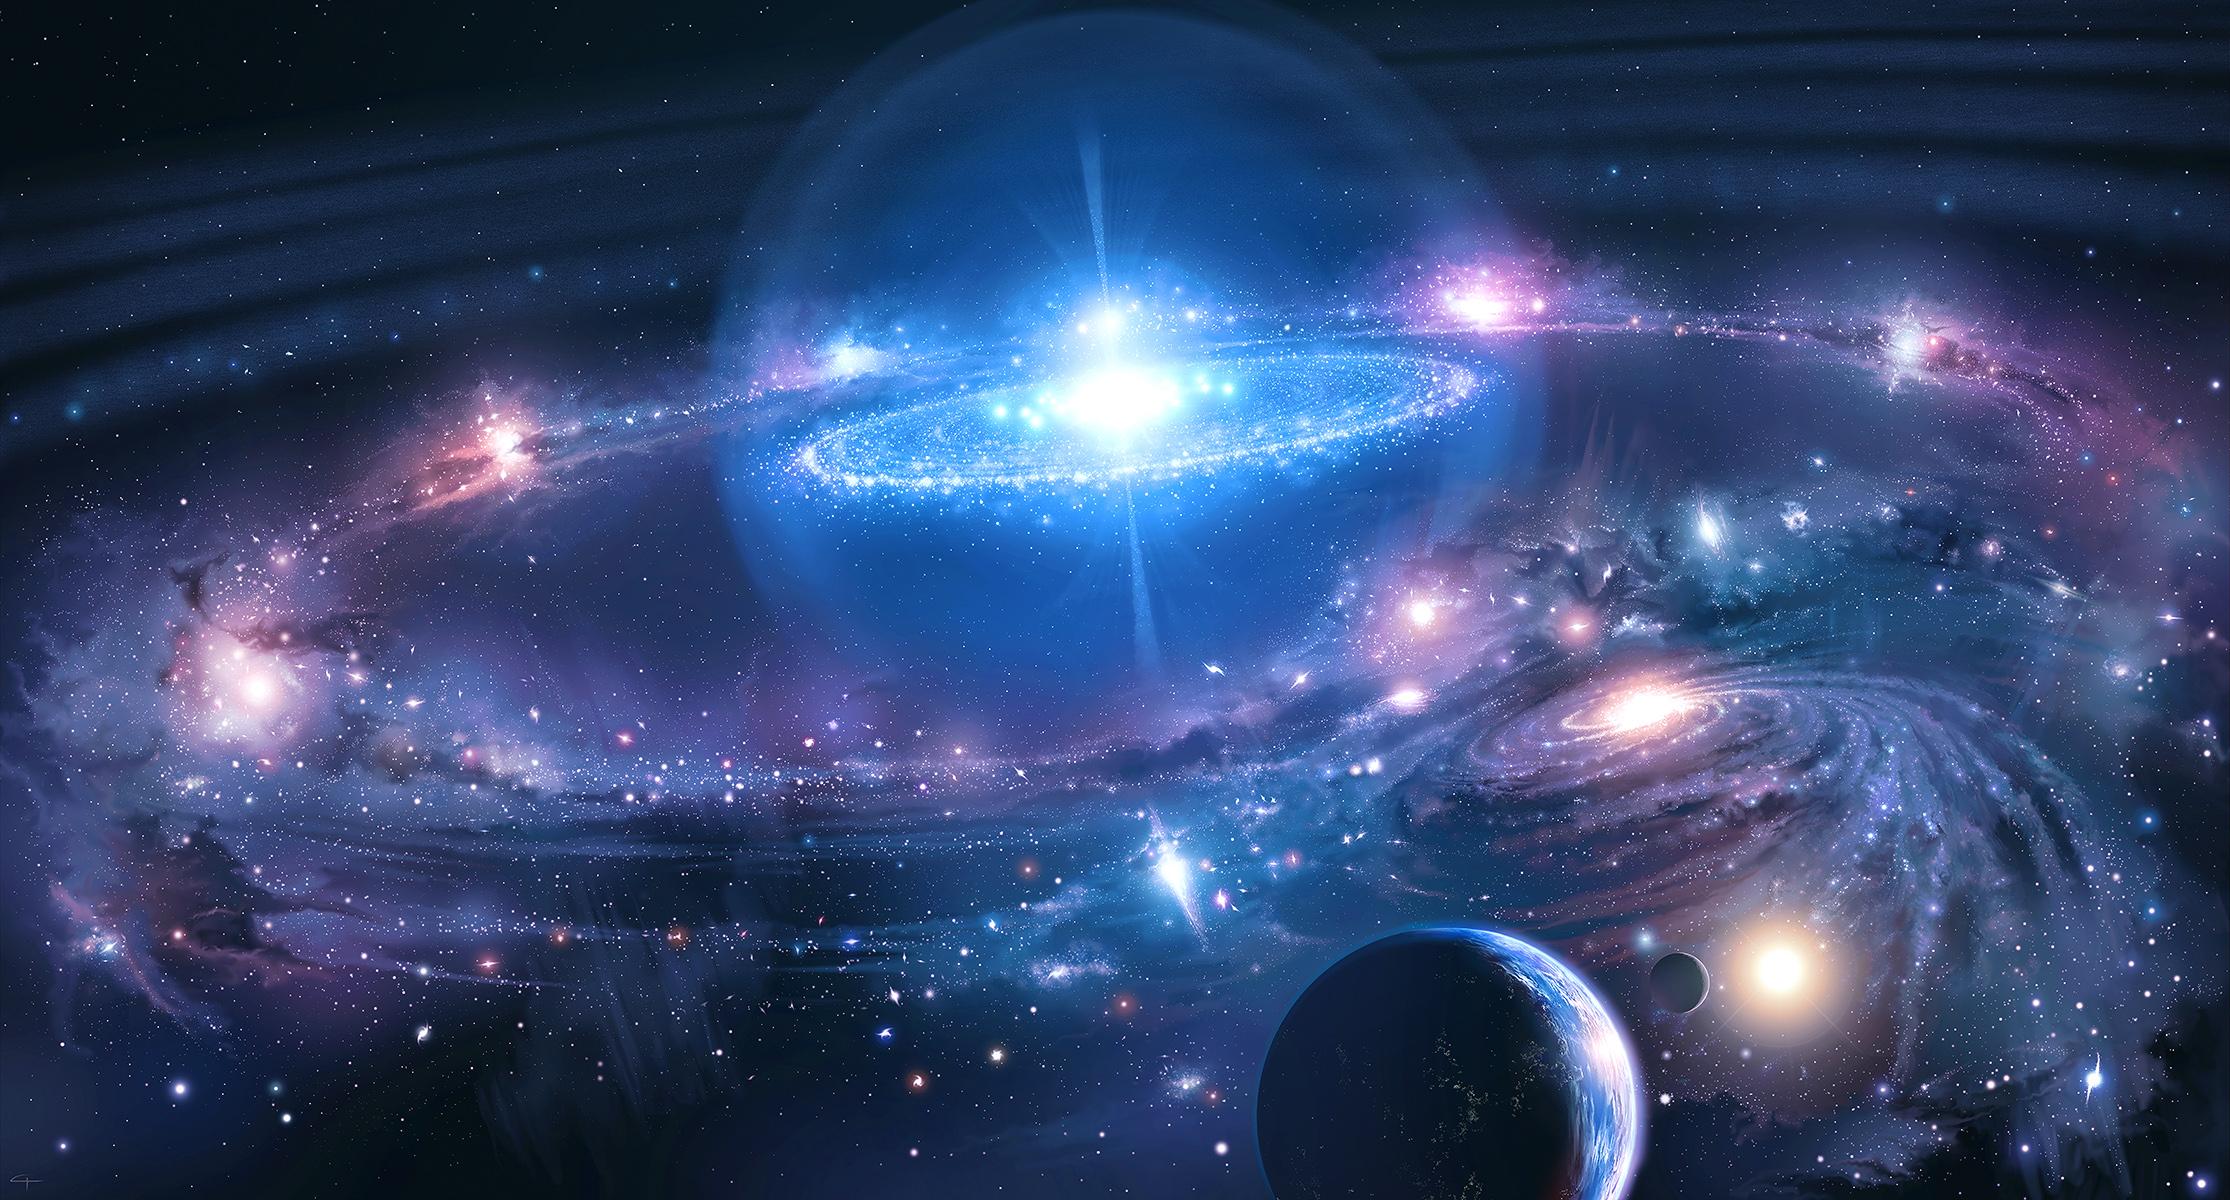 Galáxia Papel De Parede HD